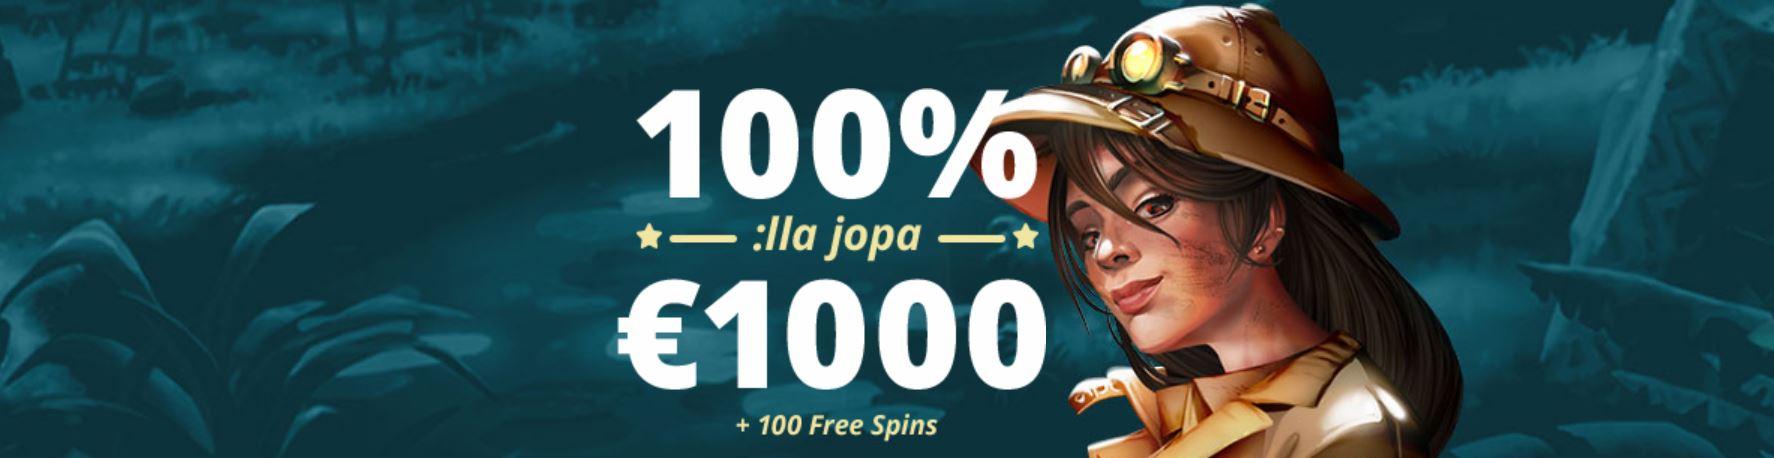 100% bonus + 100 spins